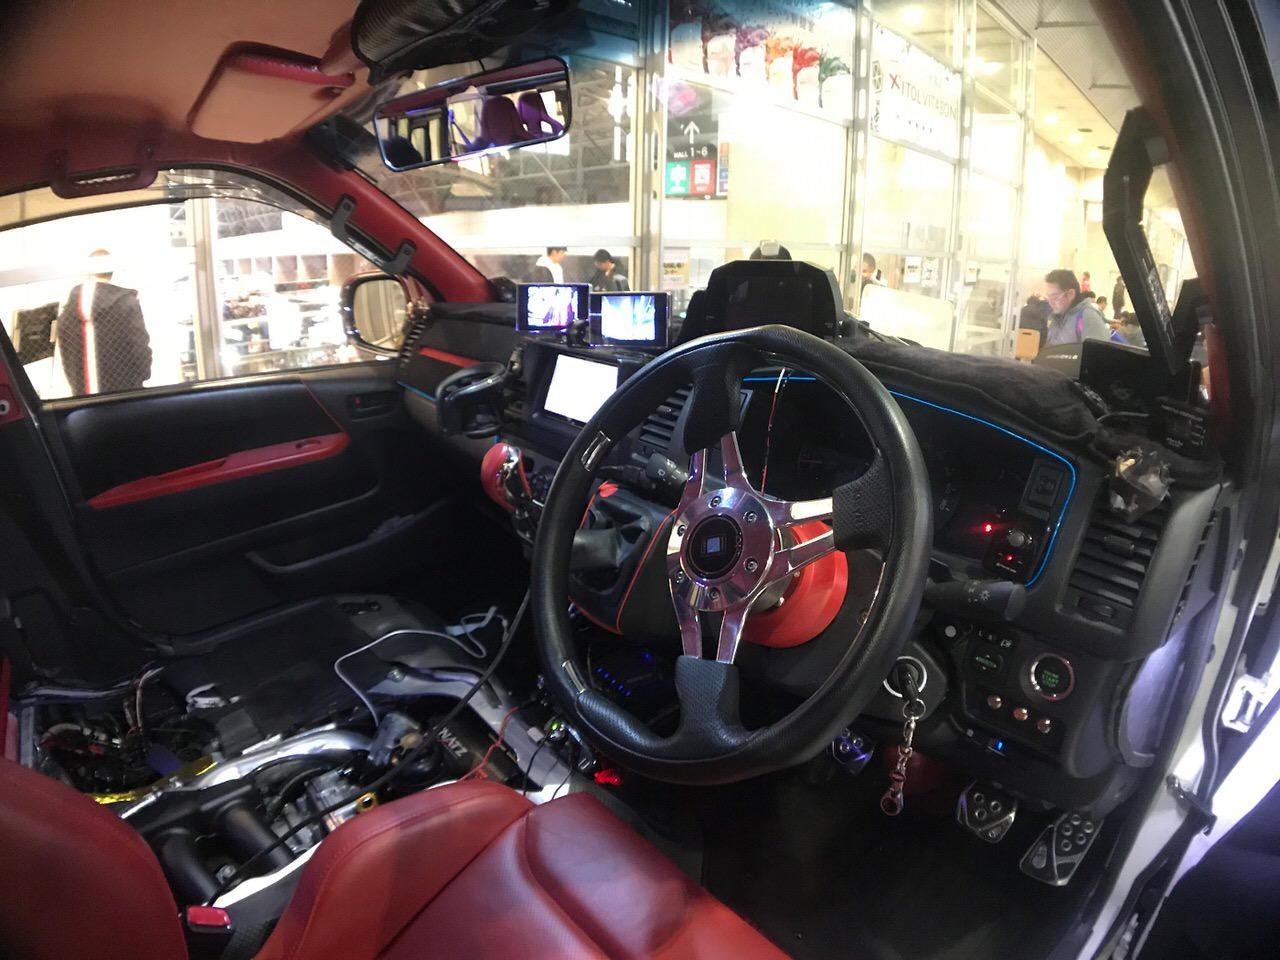 Tokyo auto salon 2018 0112163930